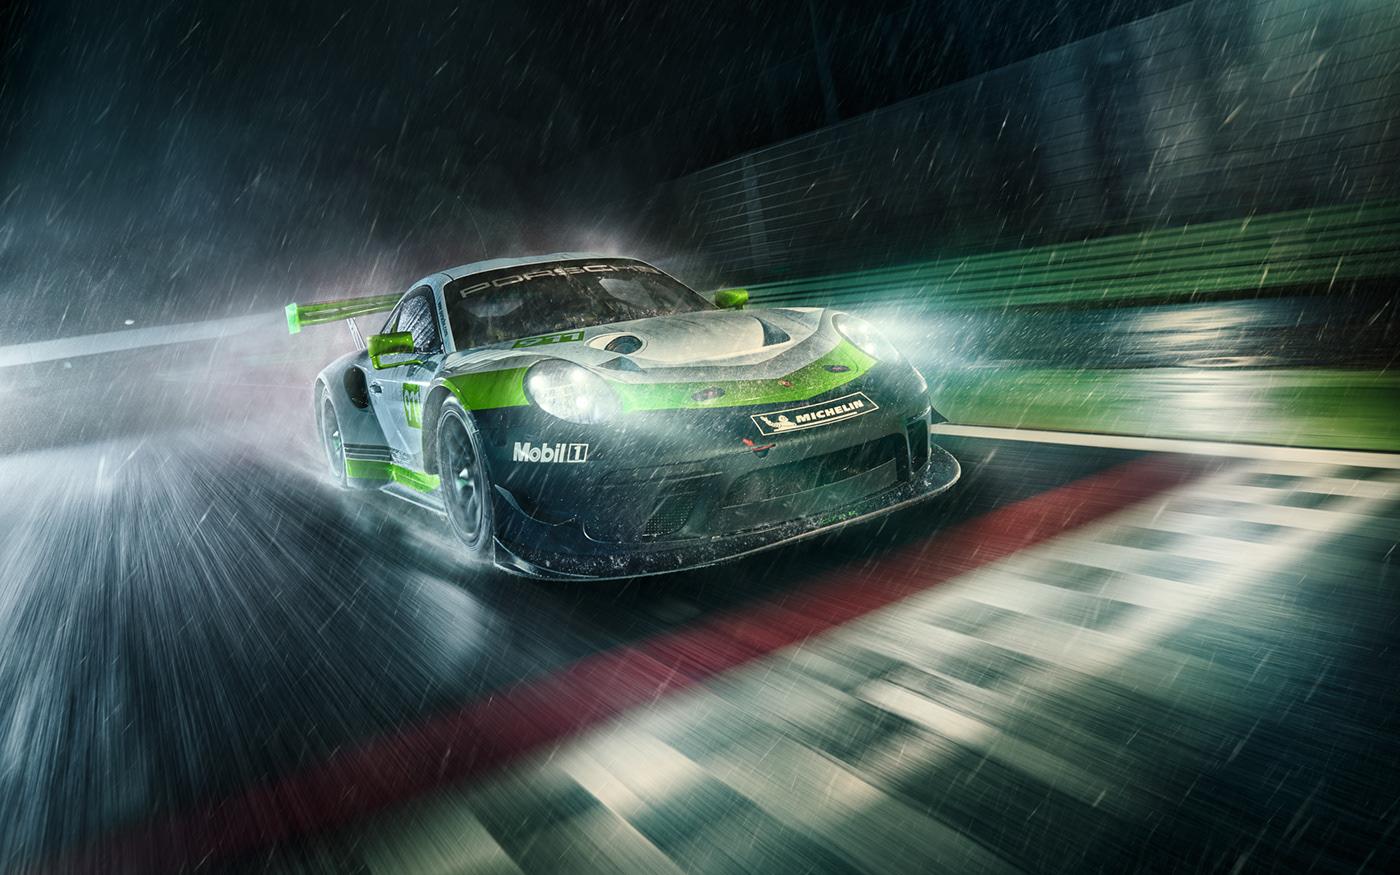 automotive   campaign green Motorsport night Performance Car race race car race track supercar